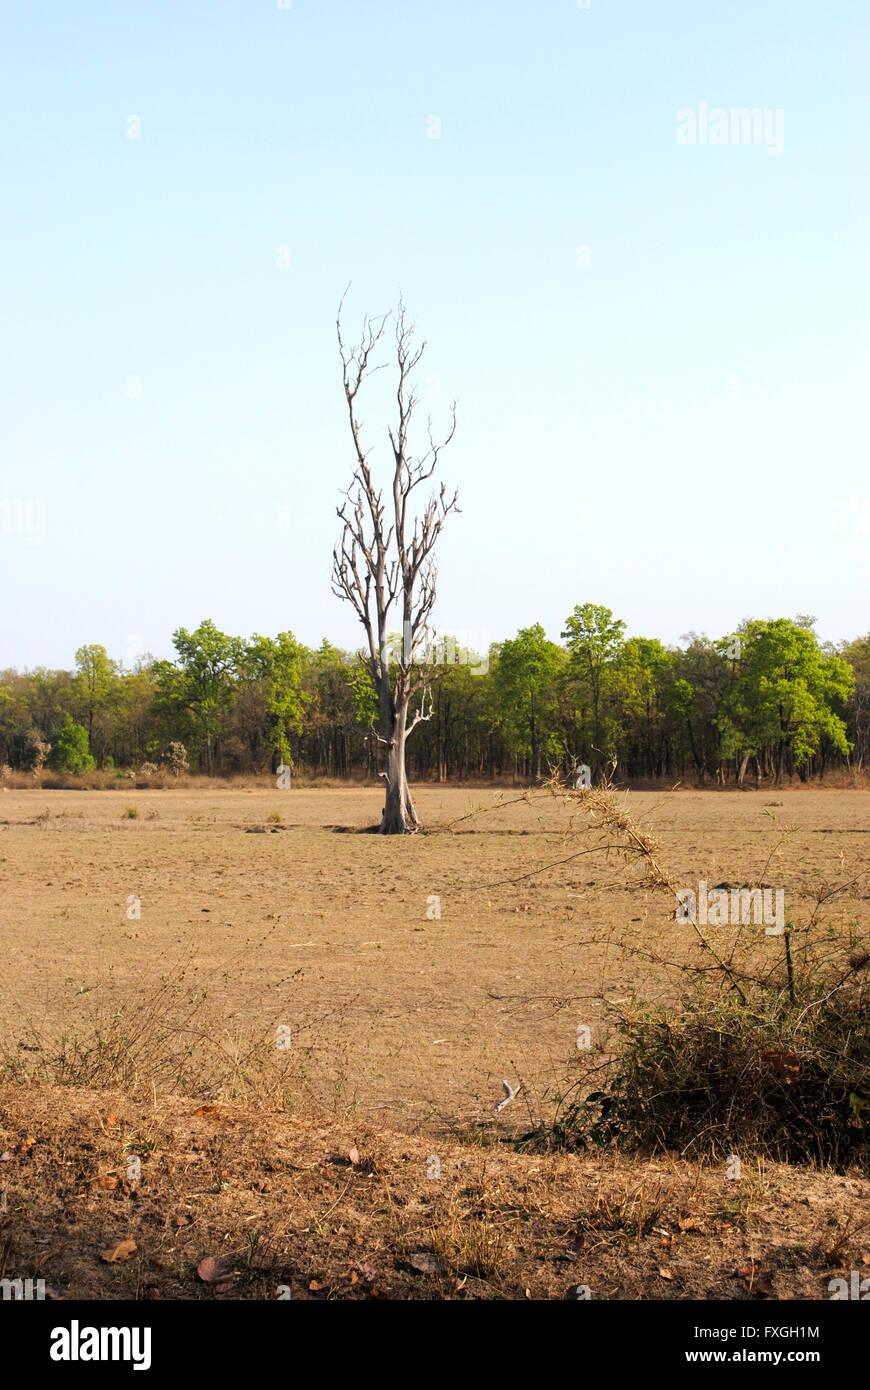 Alone in Jungle, Bandhavgarh National Park, Madhya Pradesh, India - Stock Image